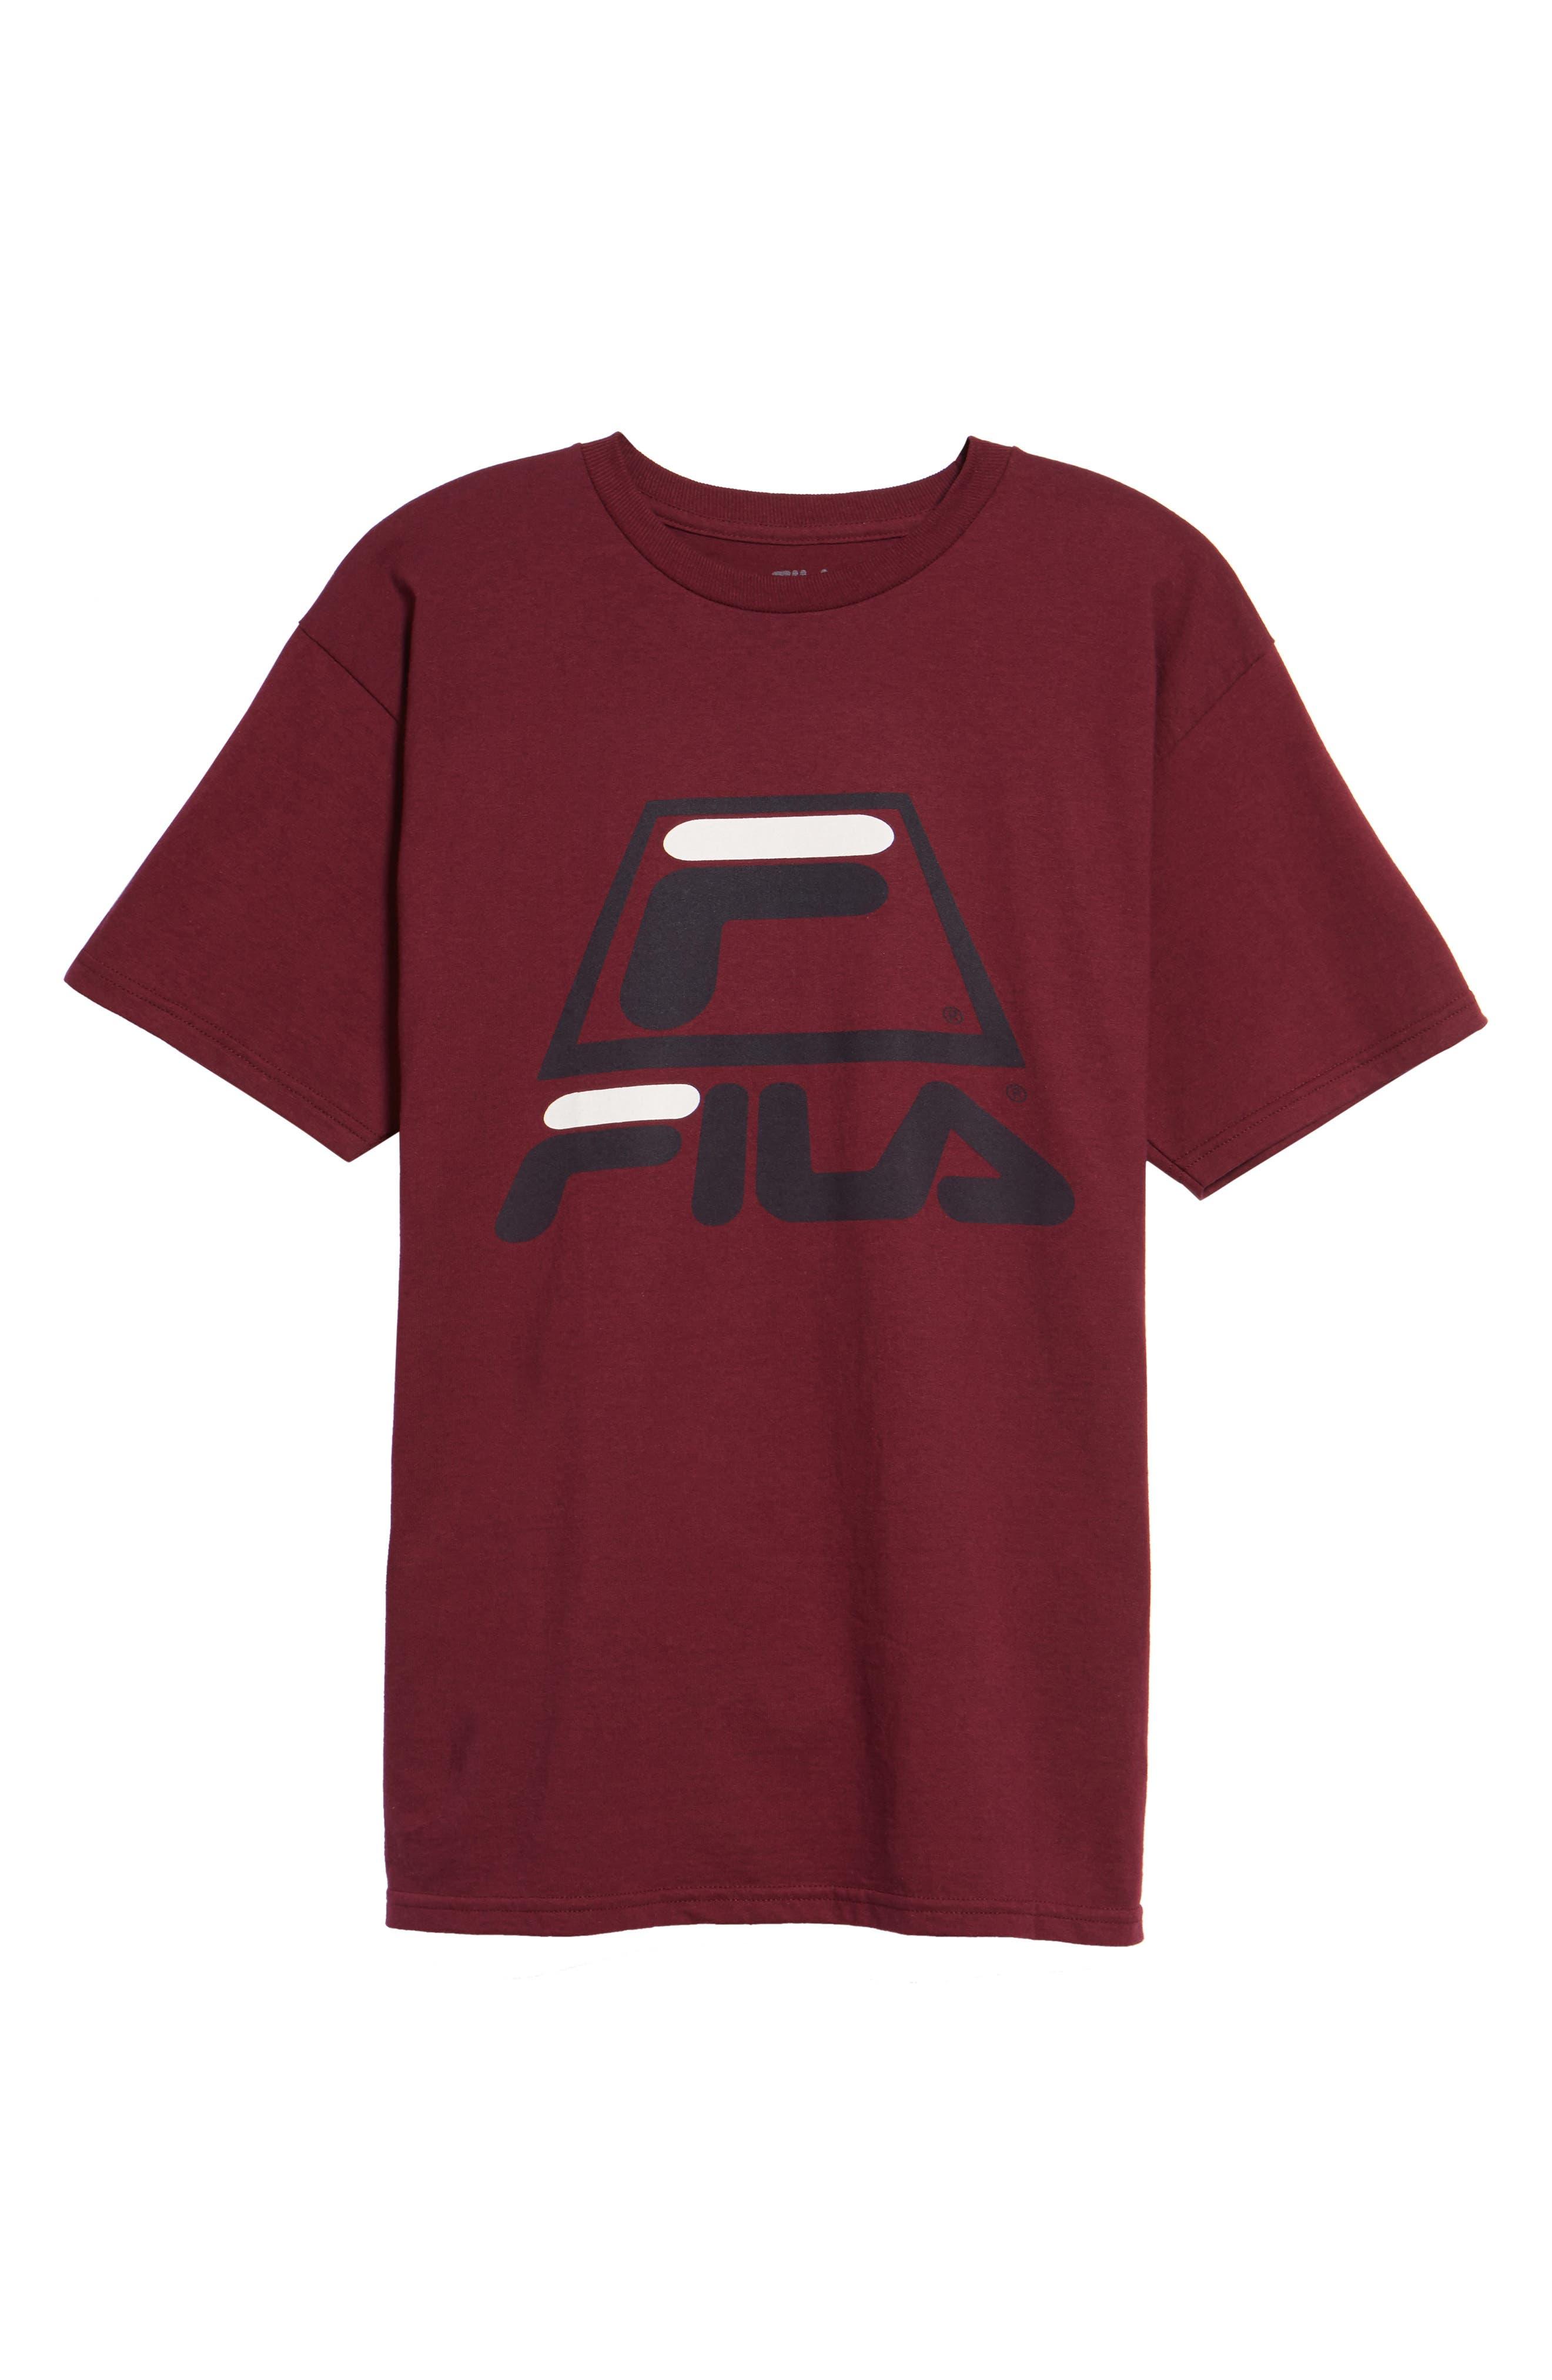 '95 T-Shirt,                             Alternate thumbnail 6, color,                             Navy/ Silver Birch/ White